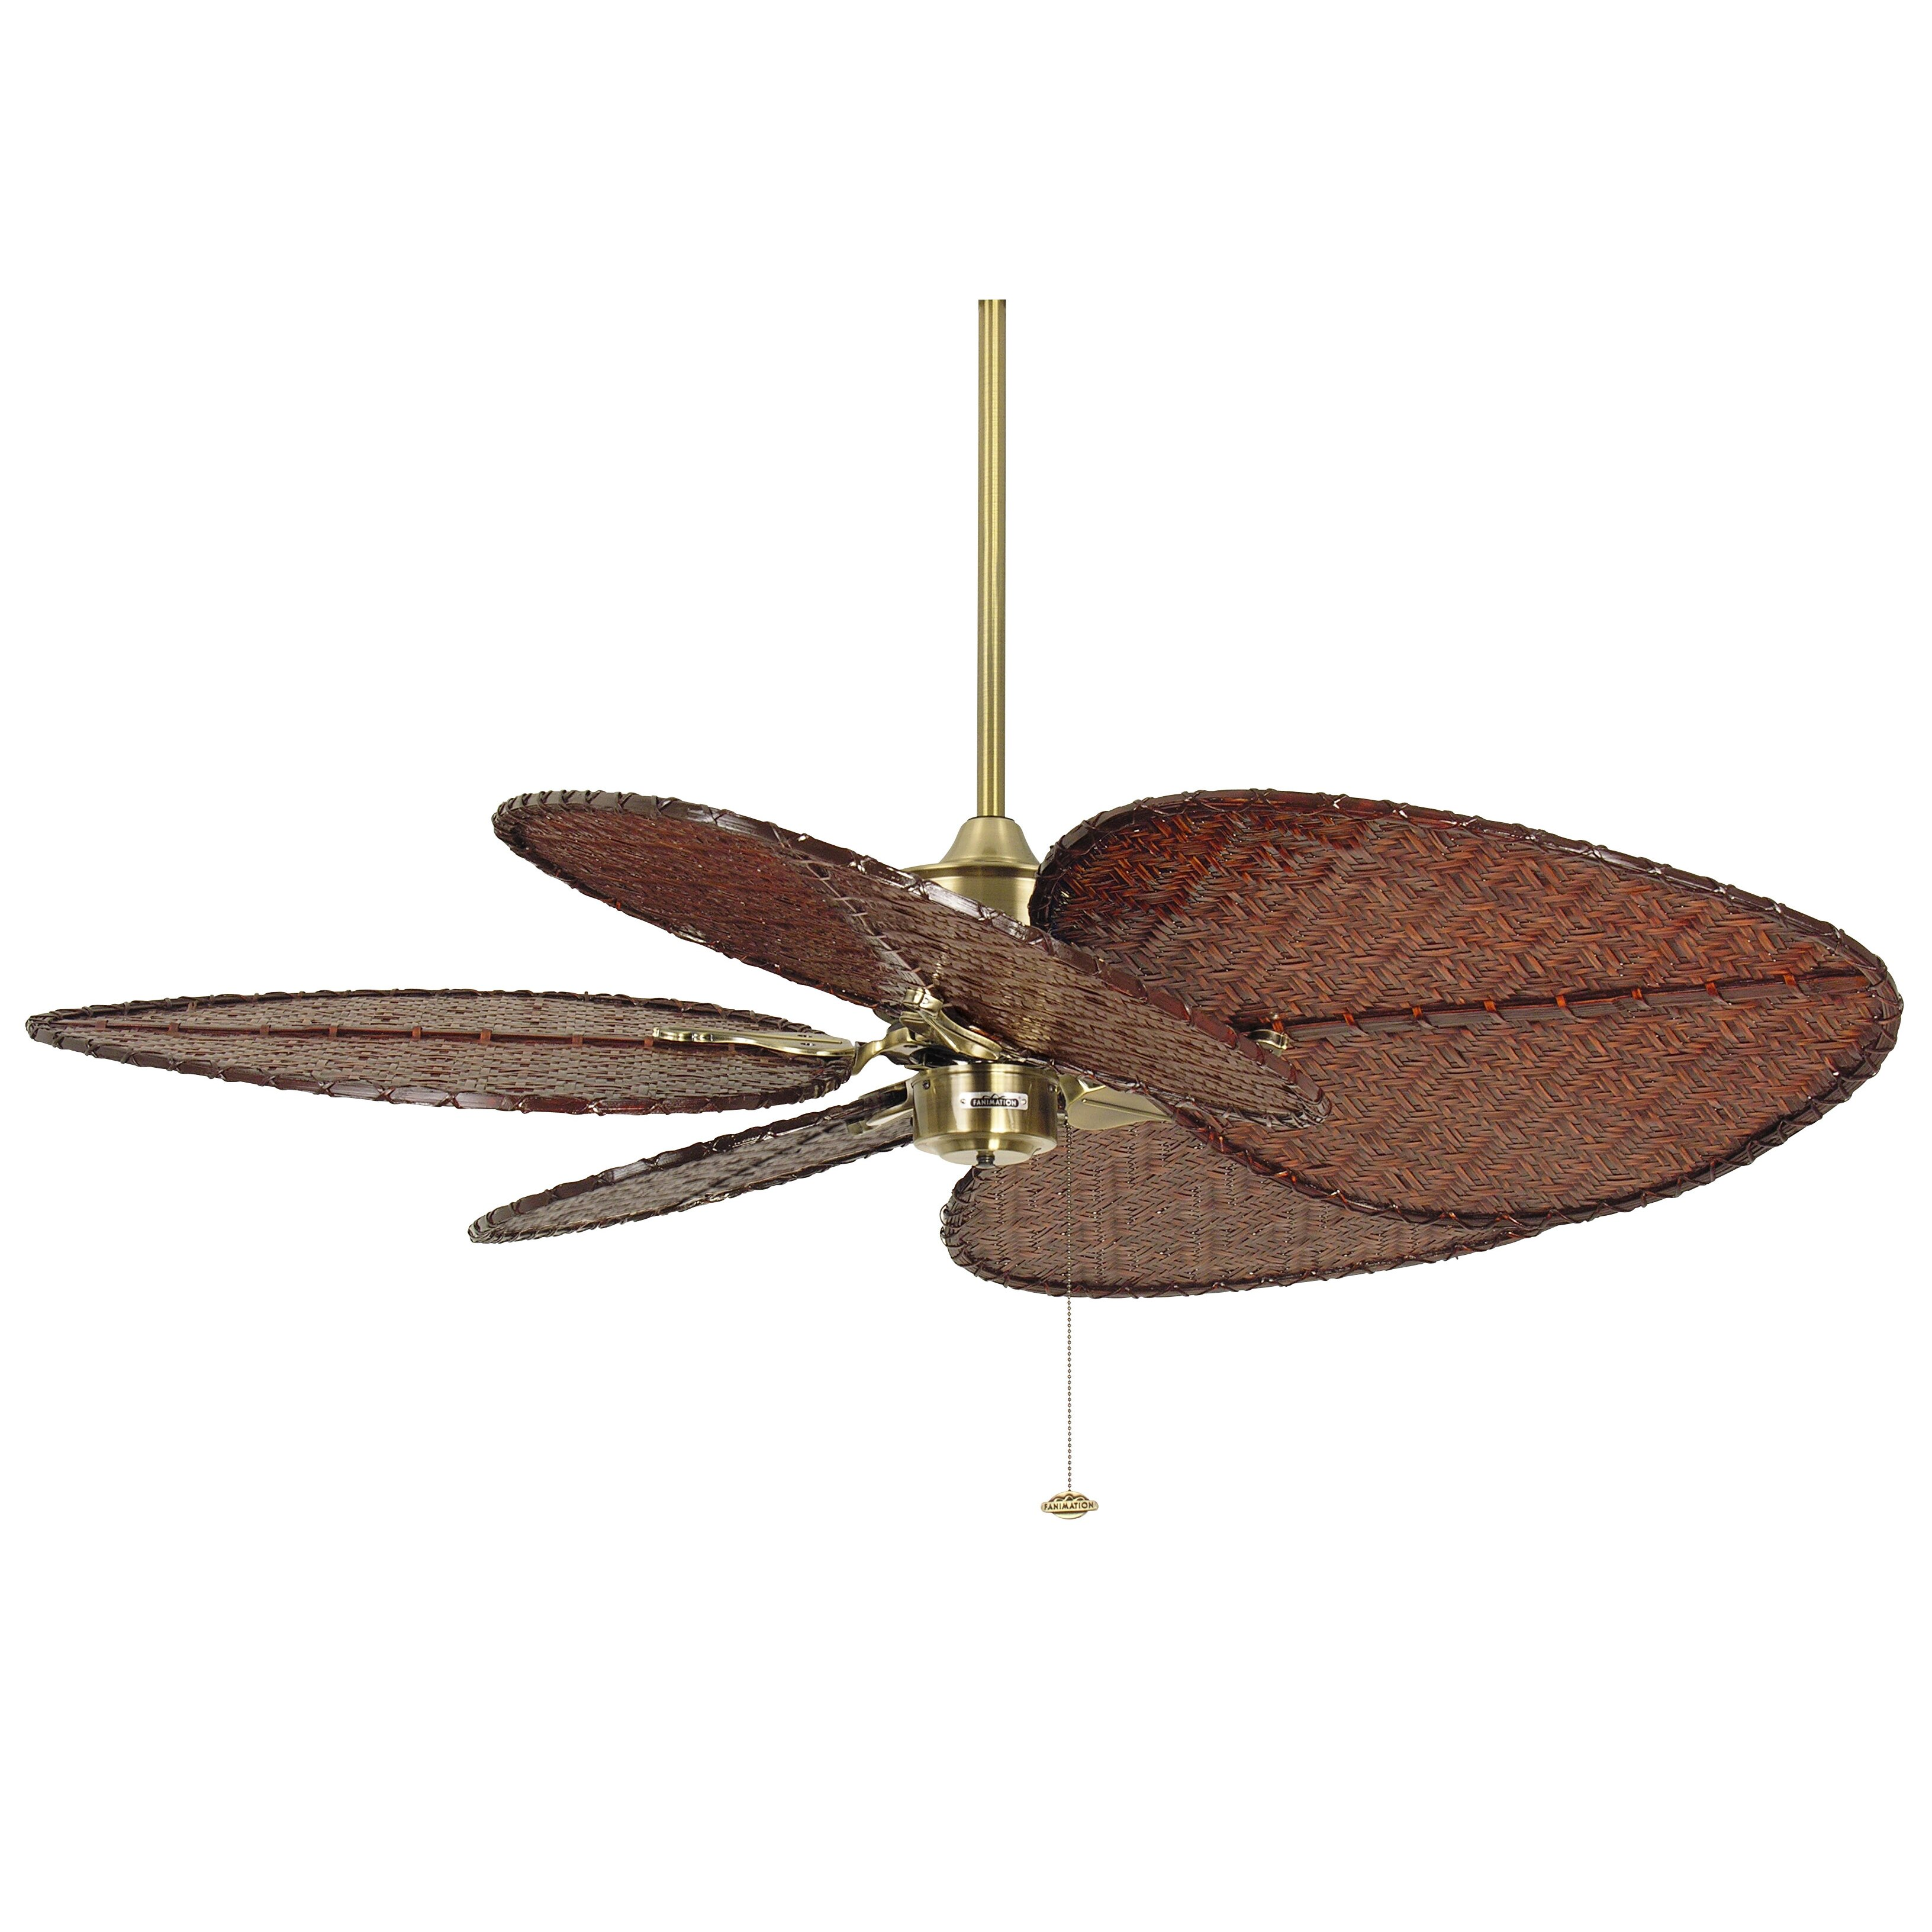 Ceiling fan with leaf blades - Fanimation 52 Quot Islander 5 Bamboo Blade Ceiling Fan